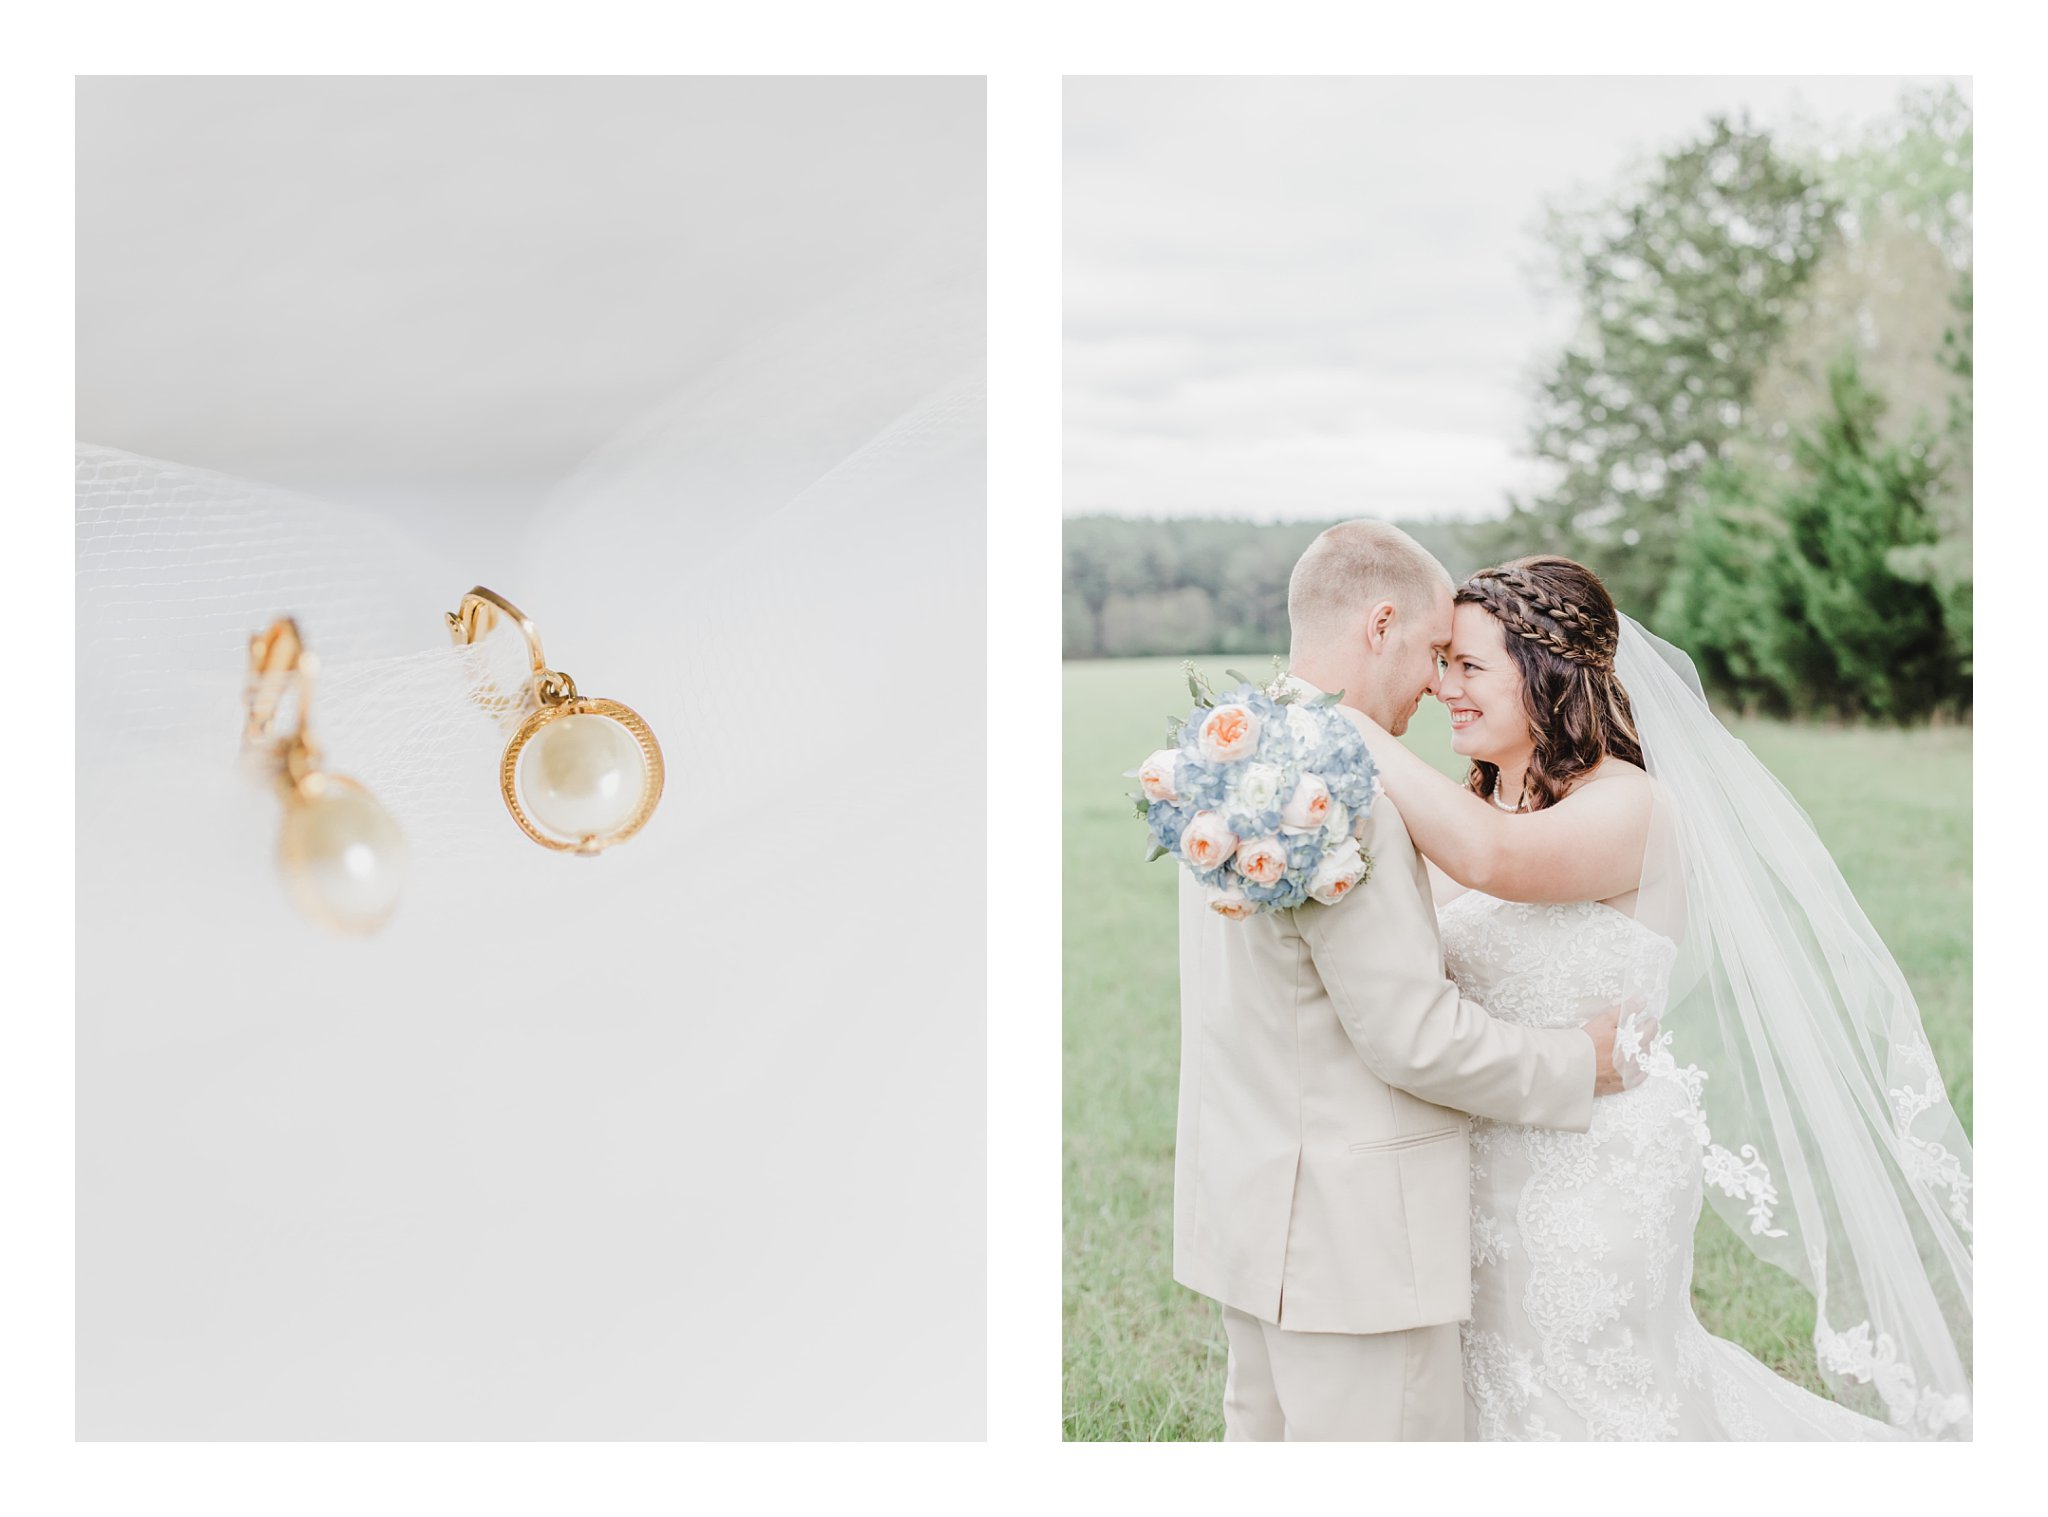 steel-blue-blush-spring-lace-gown-newberry-sc-wedding-photos-_0026.jpg